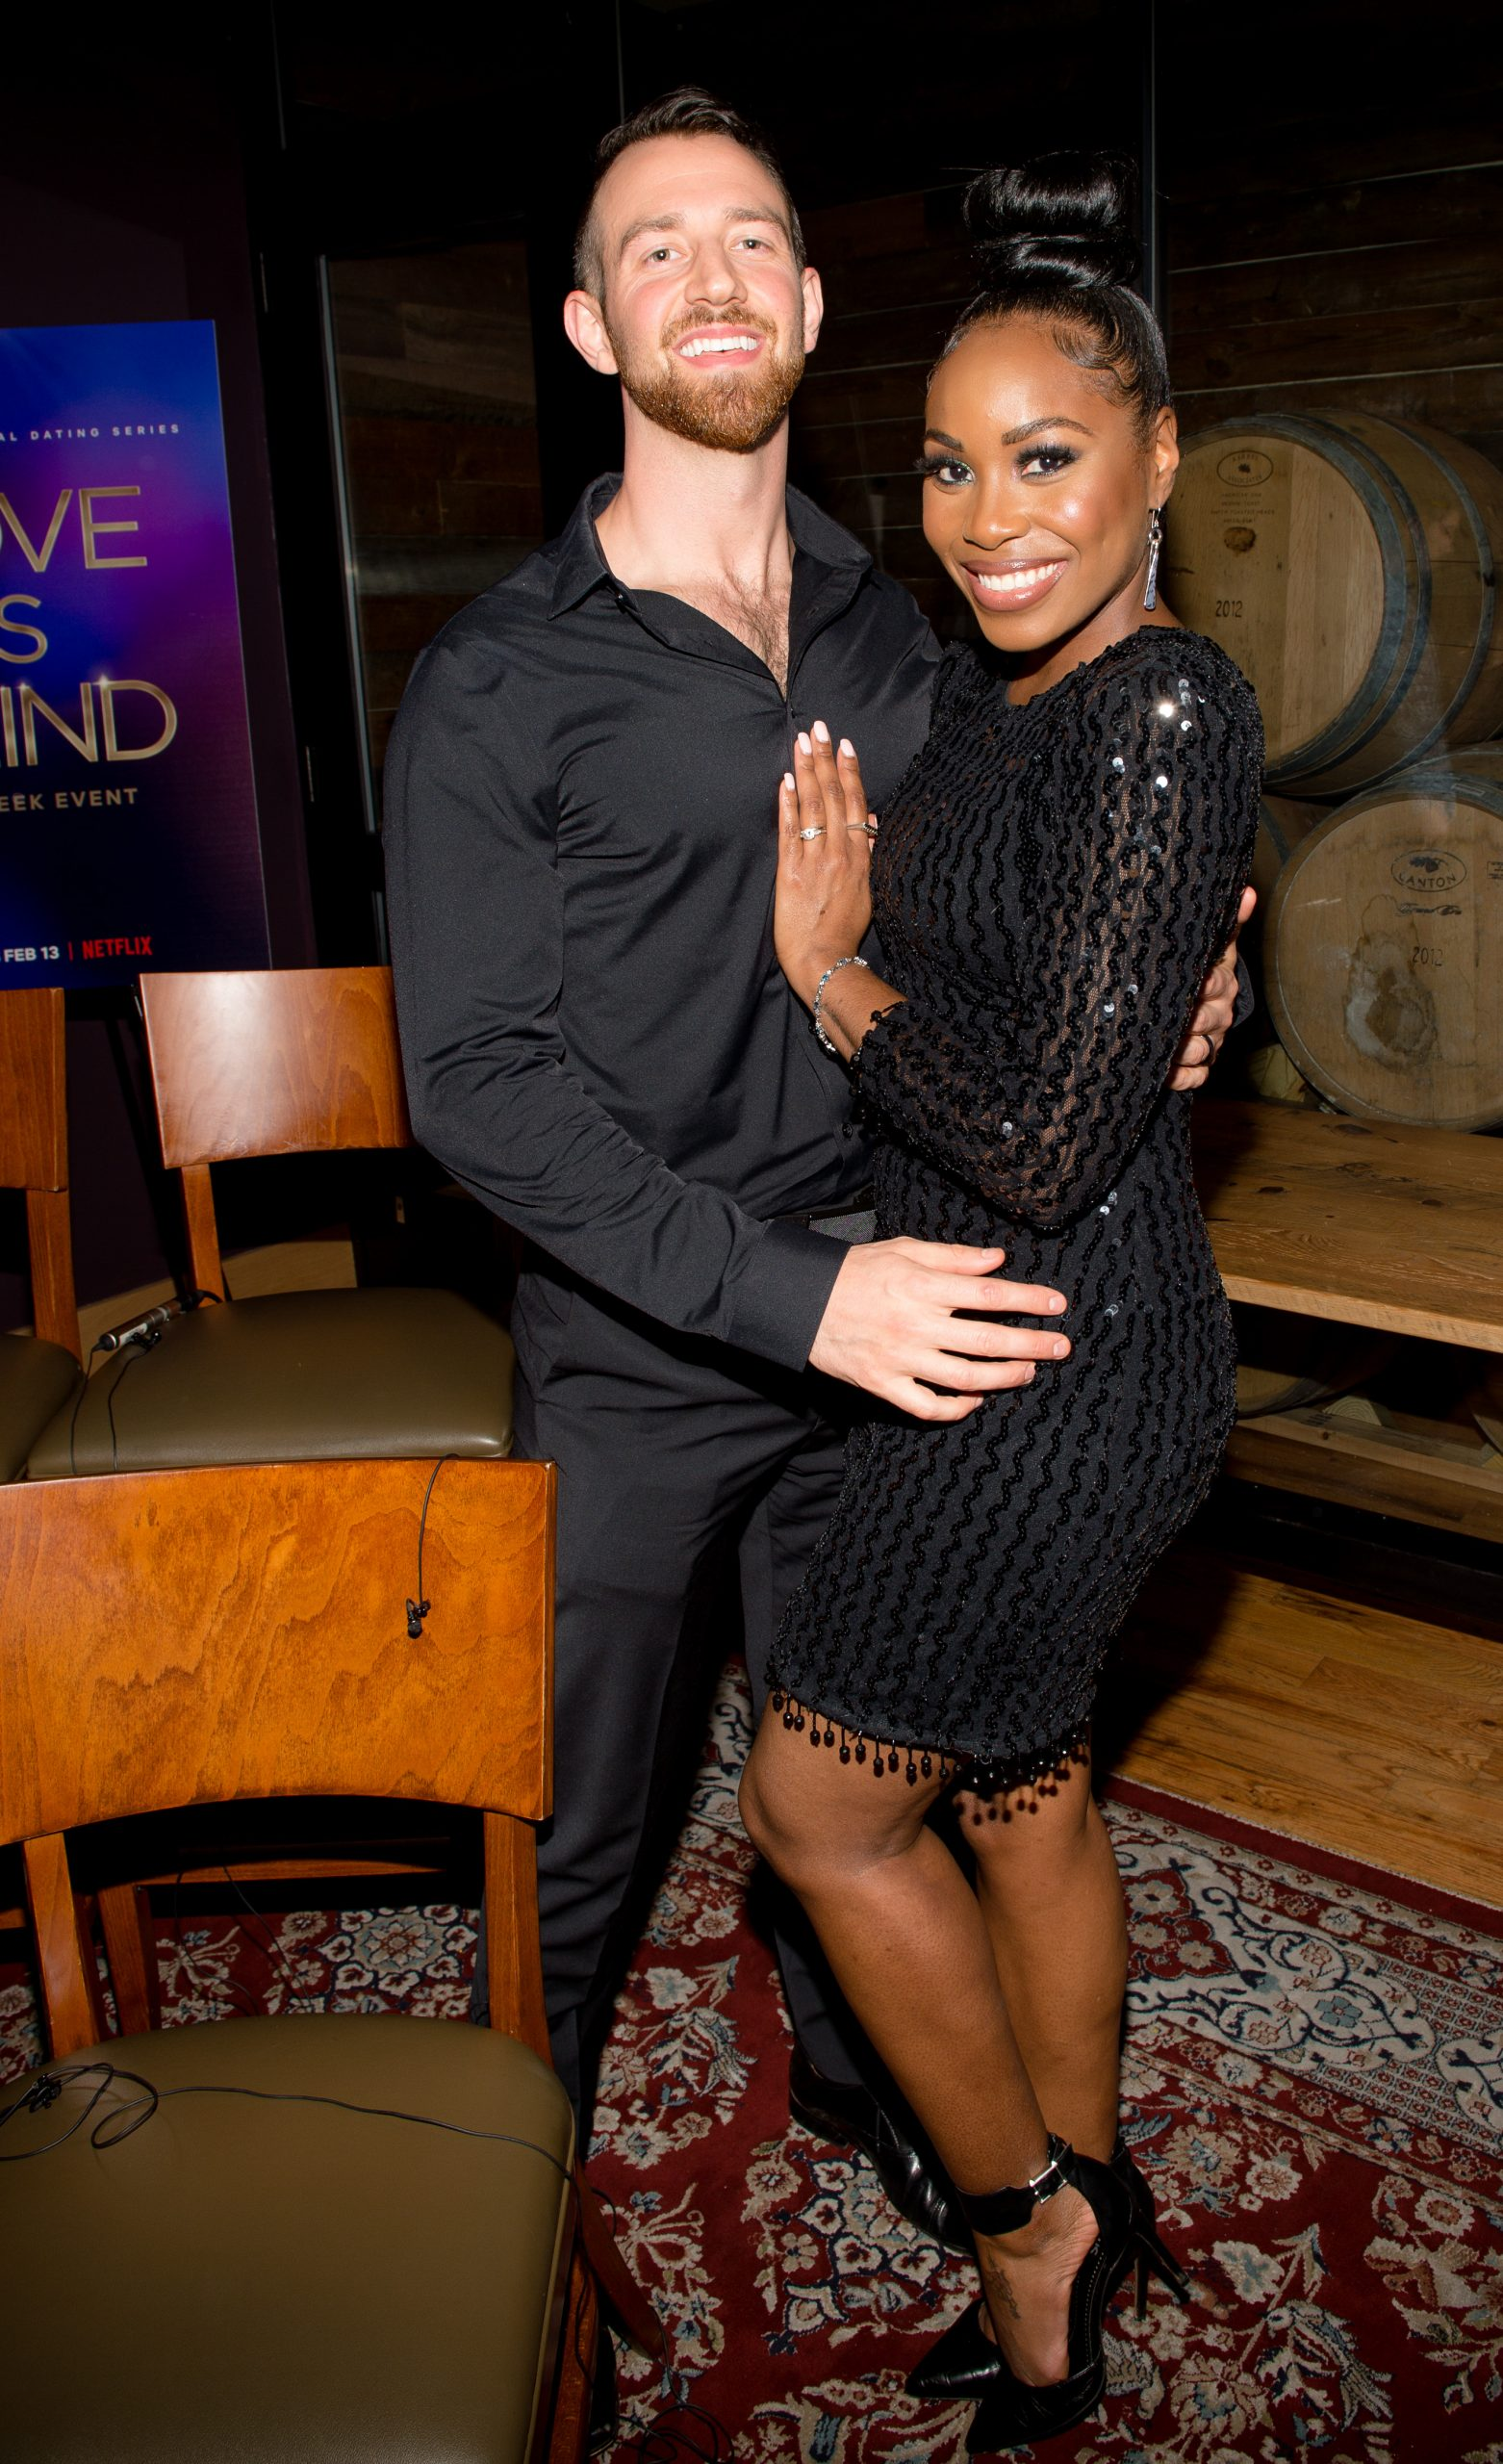 Pics: Netflix 'Love Is Blind' Atlanta Viewing Party